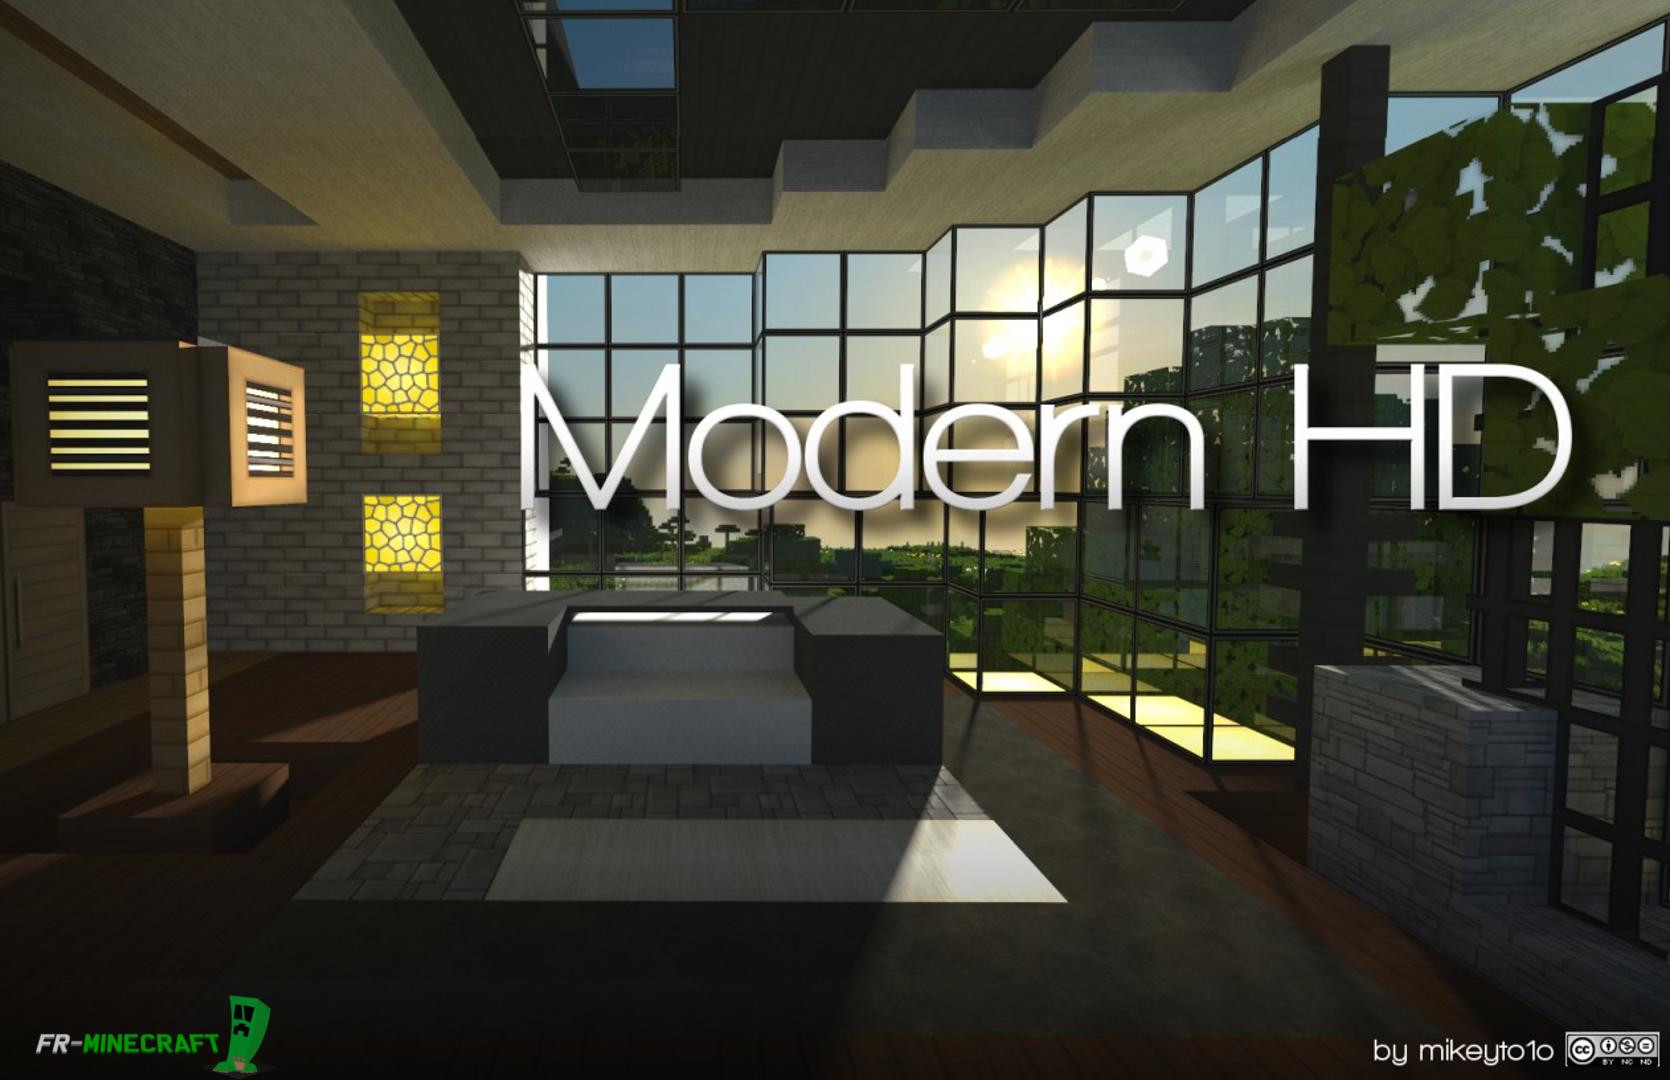 Minecraft maison tr s moderne maison moderne for Maison tres moderne